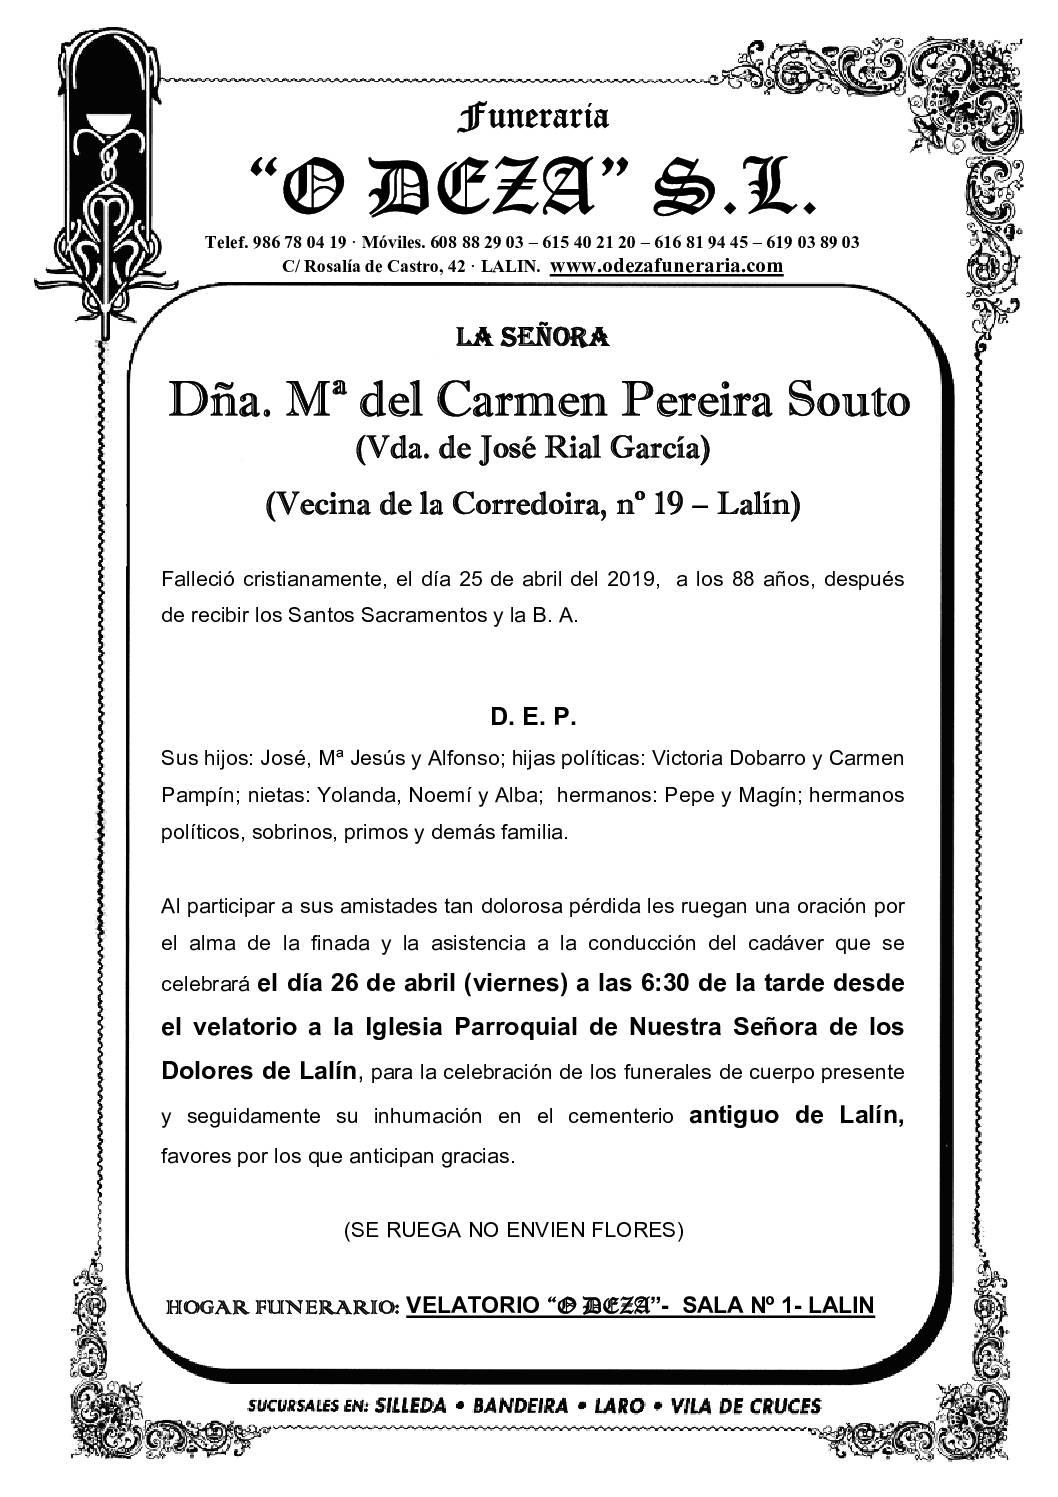 Mª DEL CARMEN PEREIRA SOUTO